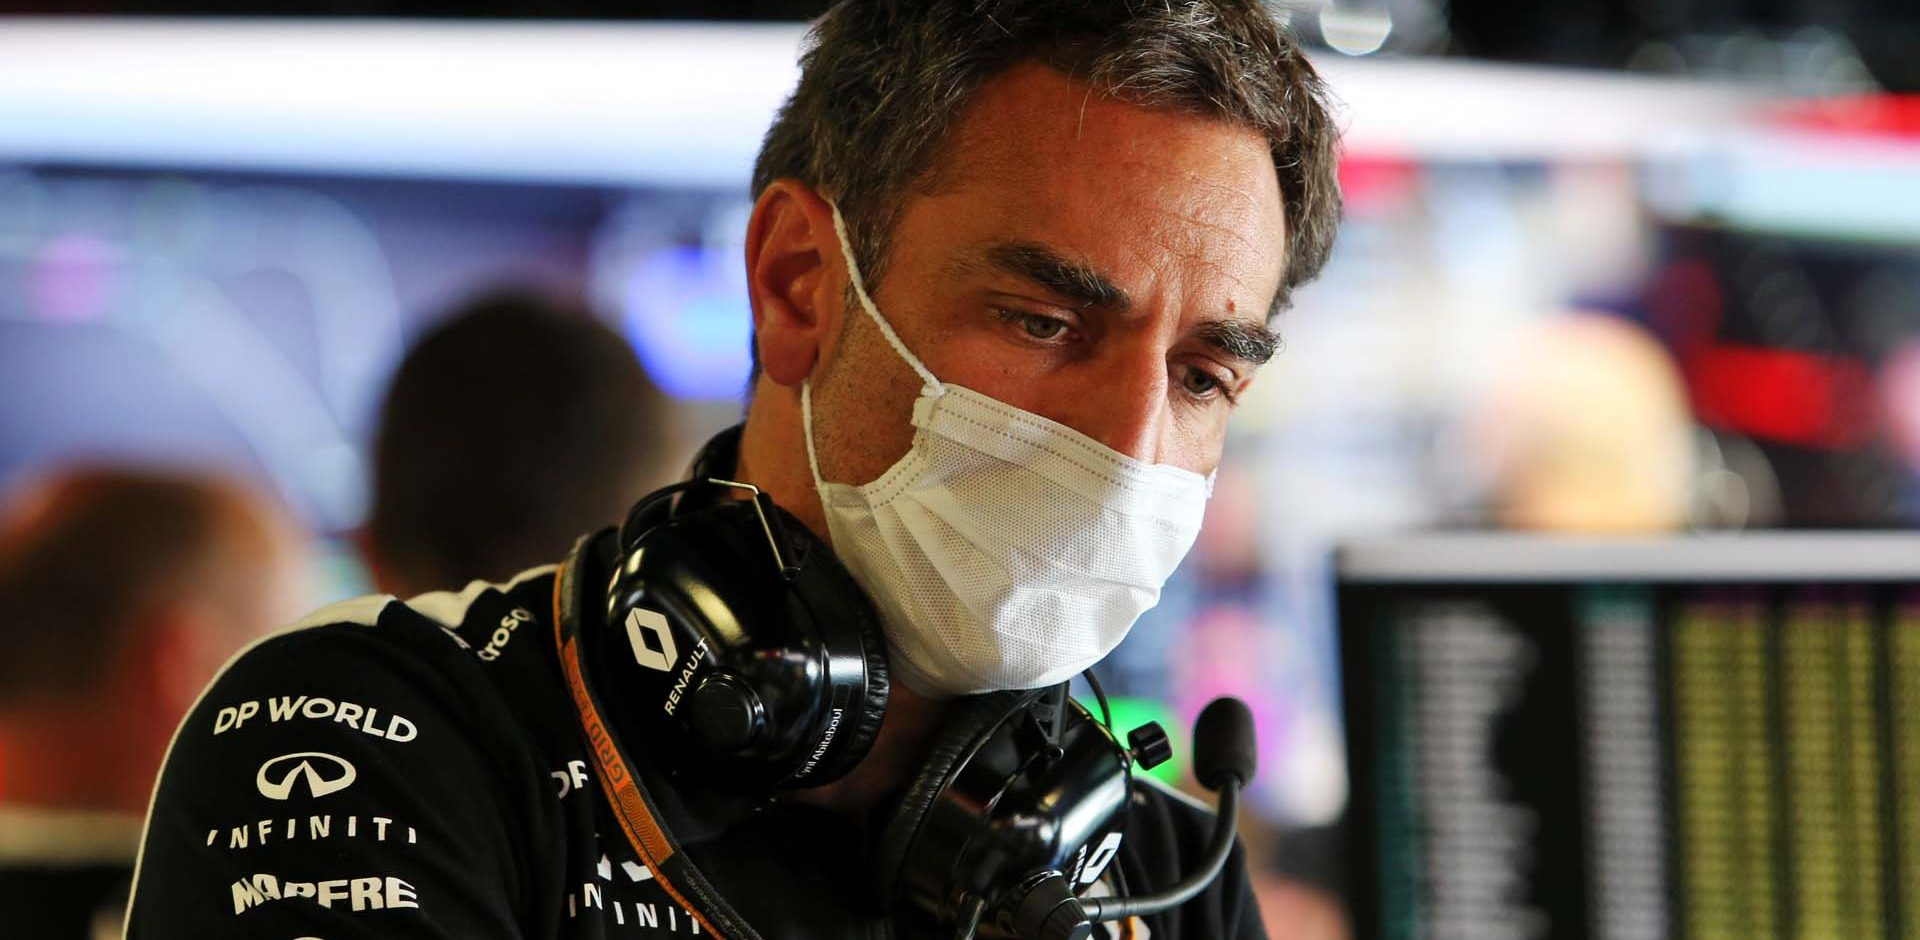 Cyril Abiteboul (FRA) Renault Sport F1 Managing Director. Italian Grand Prix, Friday 4th September 2020. Monza Italy.